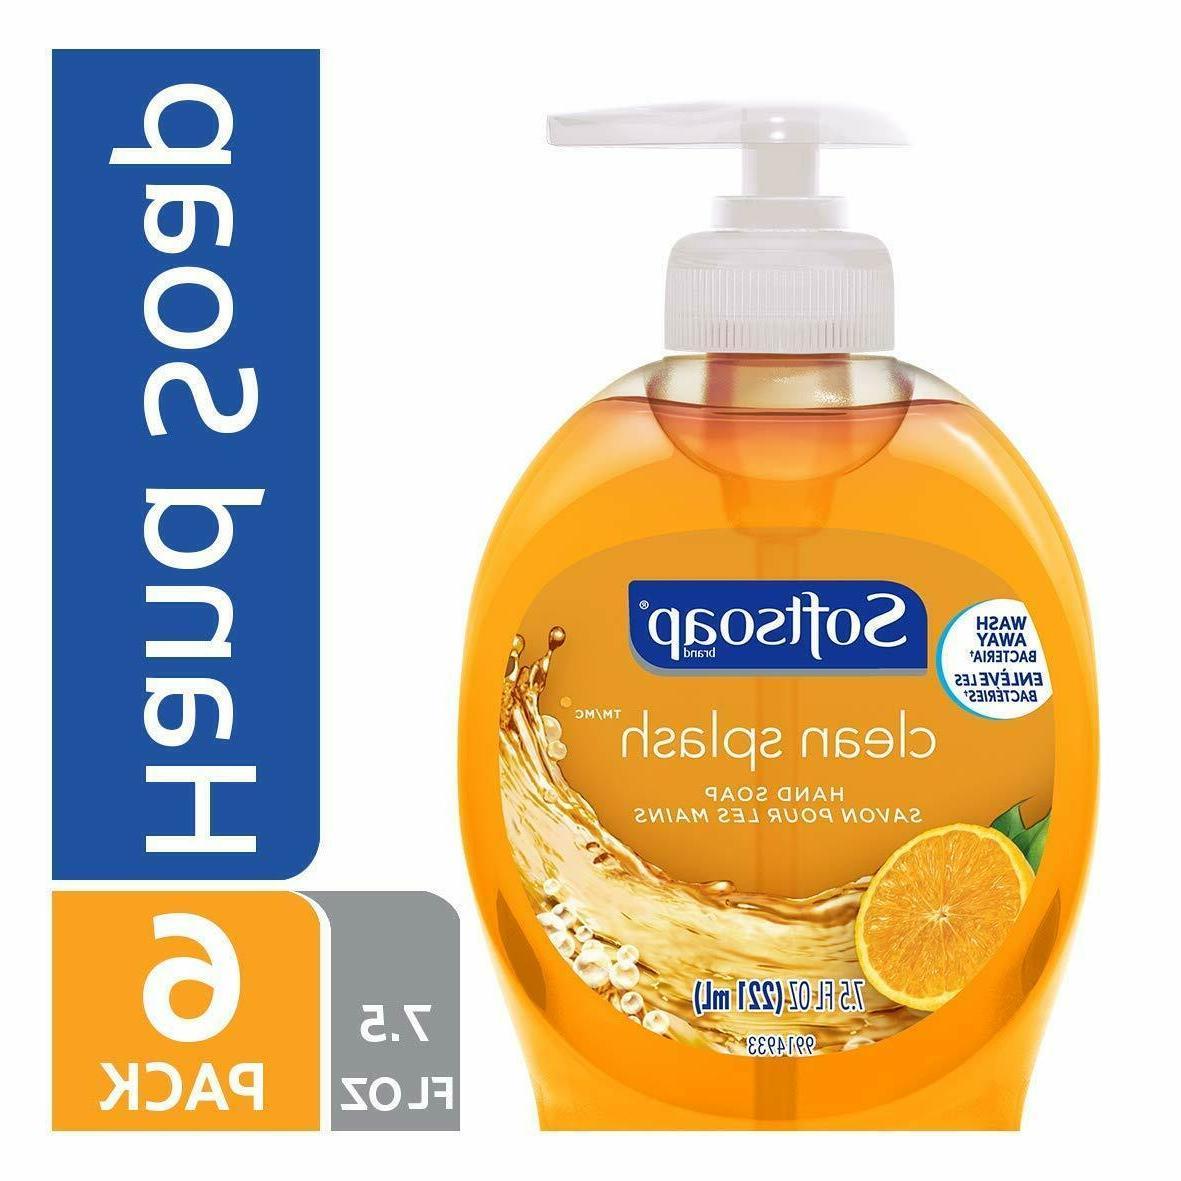 softsoap liquid hand soap clean splash 7